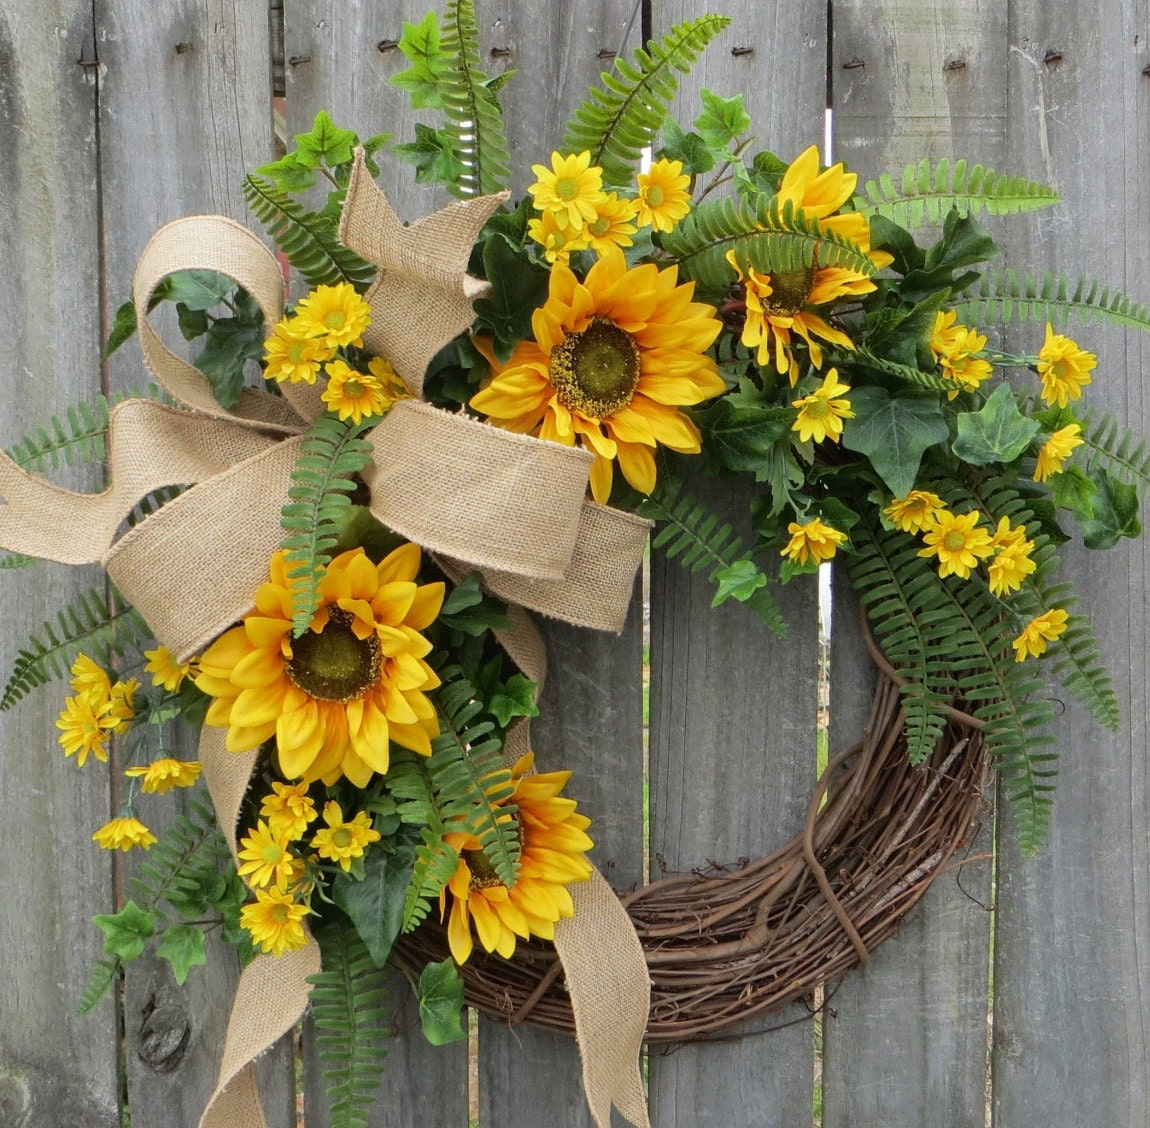 Sunflower Wreath Spring Summer Wreath Burlap Sunflower